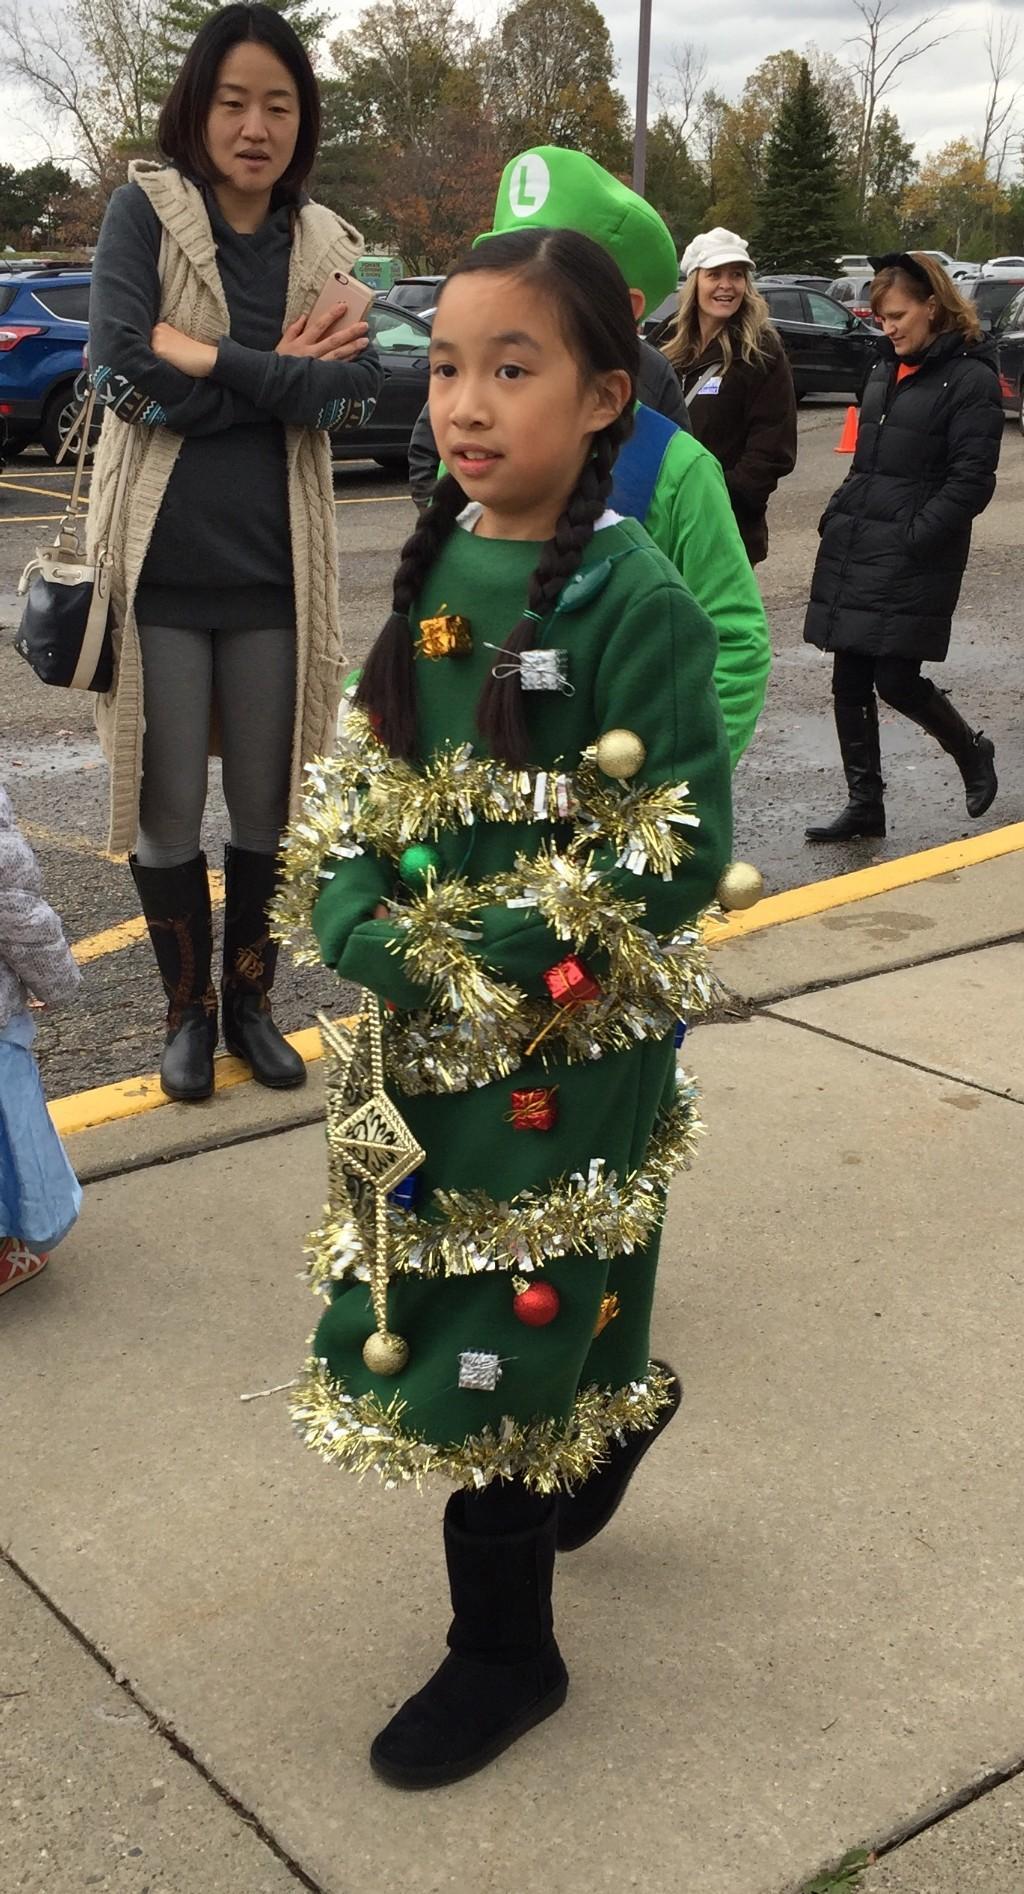 Halloween girl dressed as a Christmas Tree